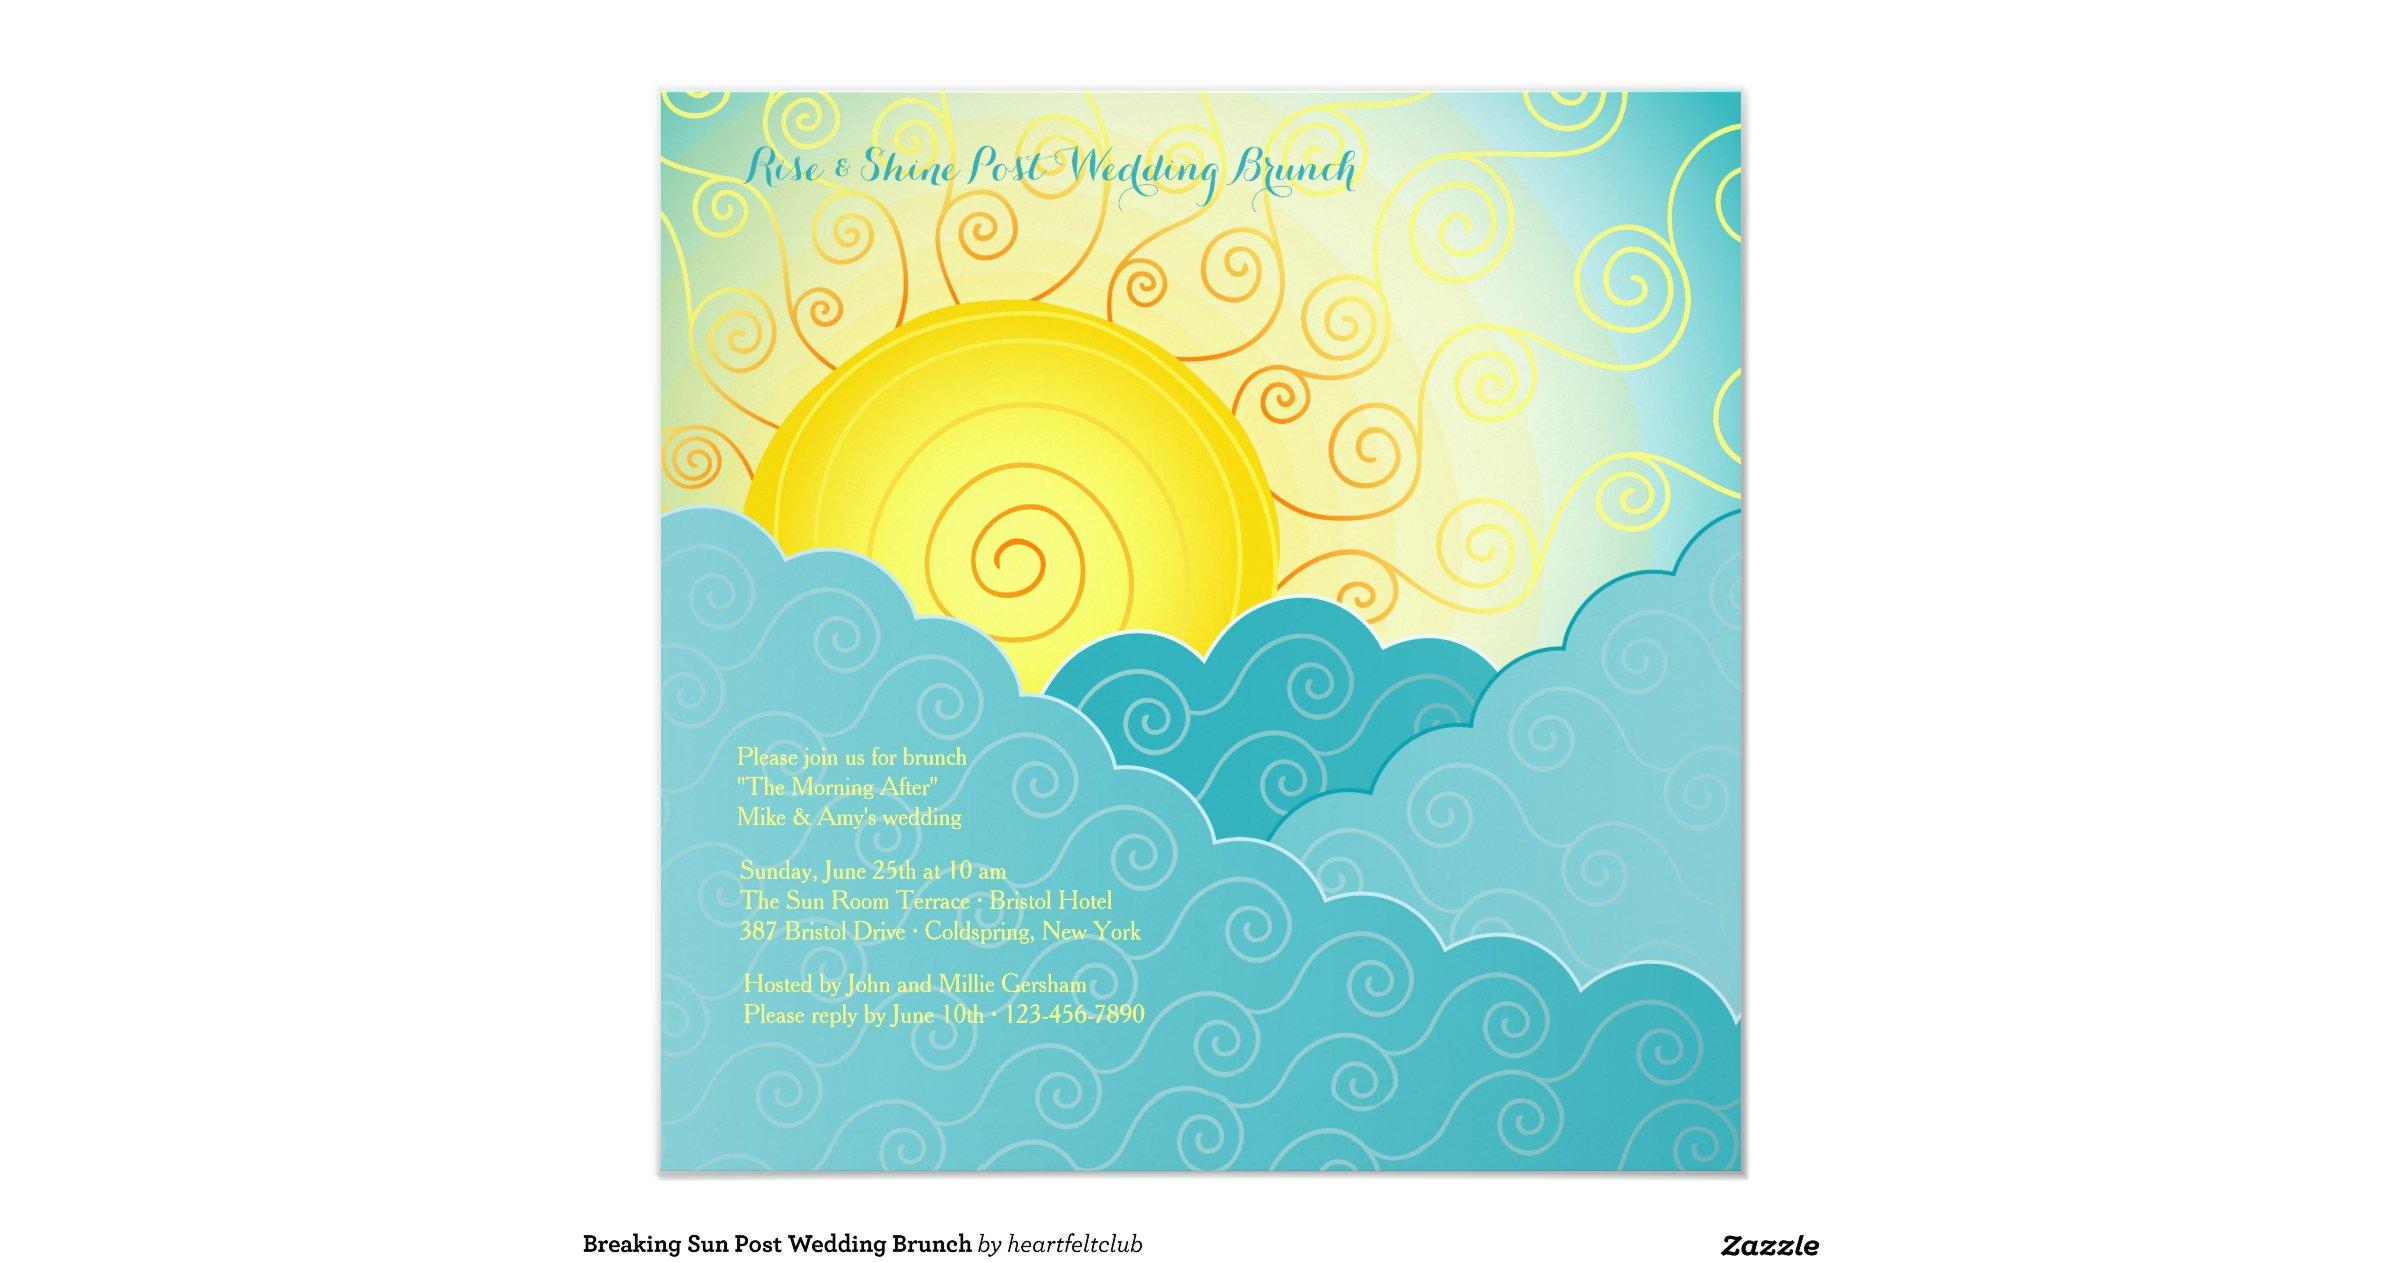 Post Wedding Brunch Invitation Wording: Breaking_sun_post_wedding_brunch_invitation